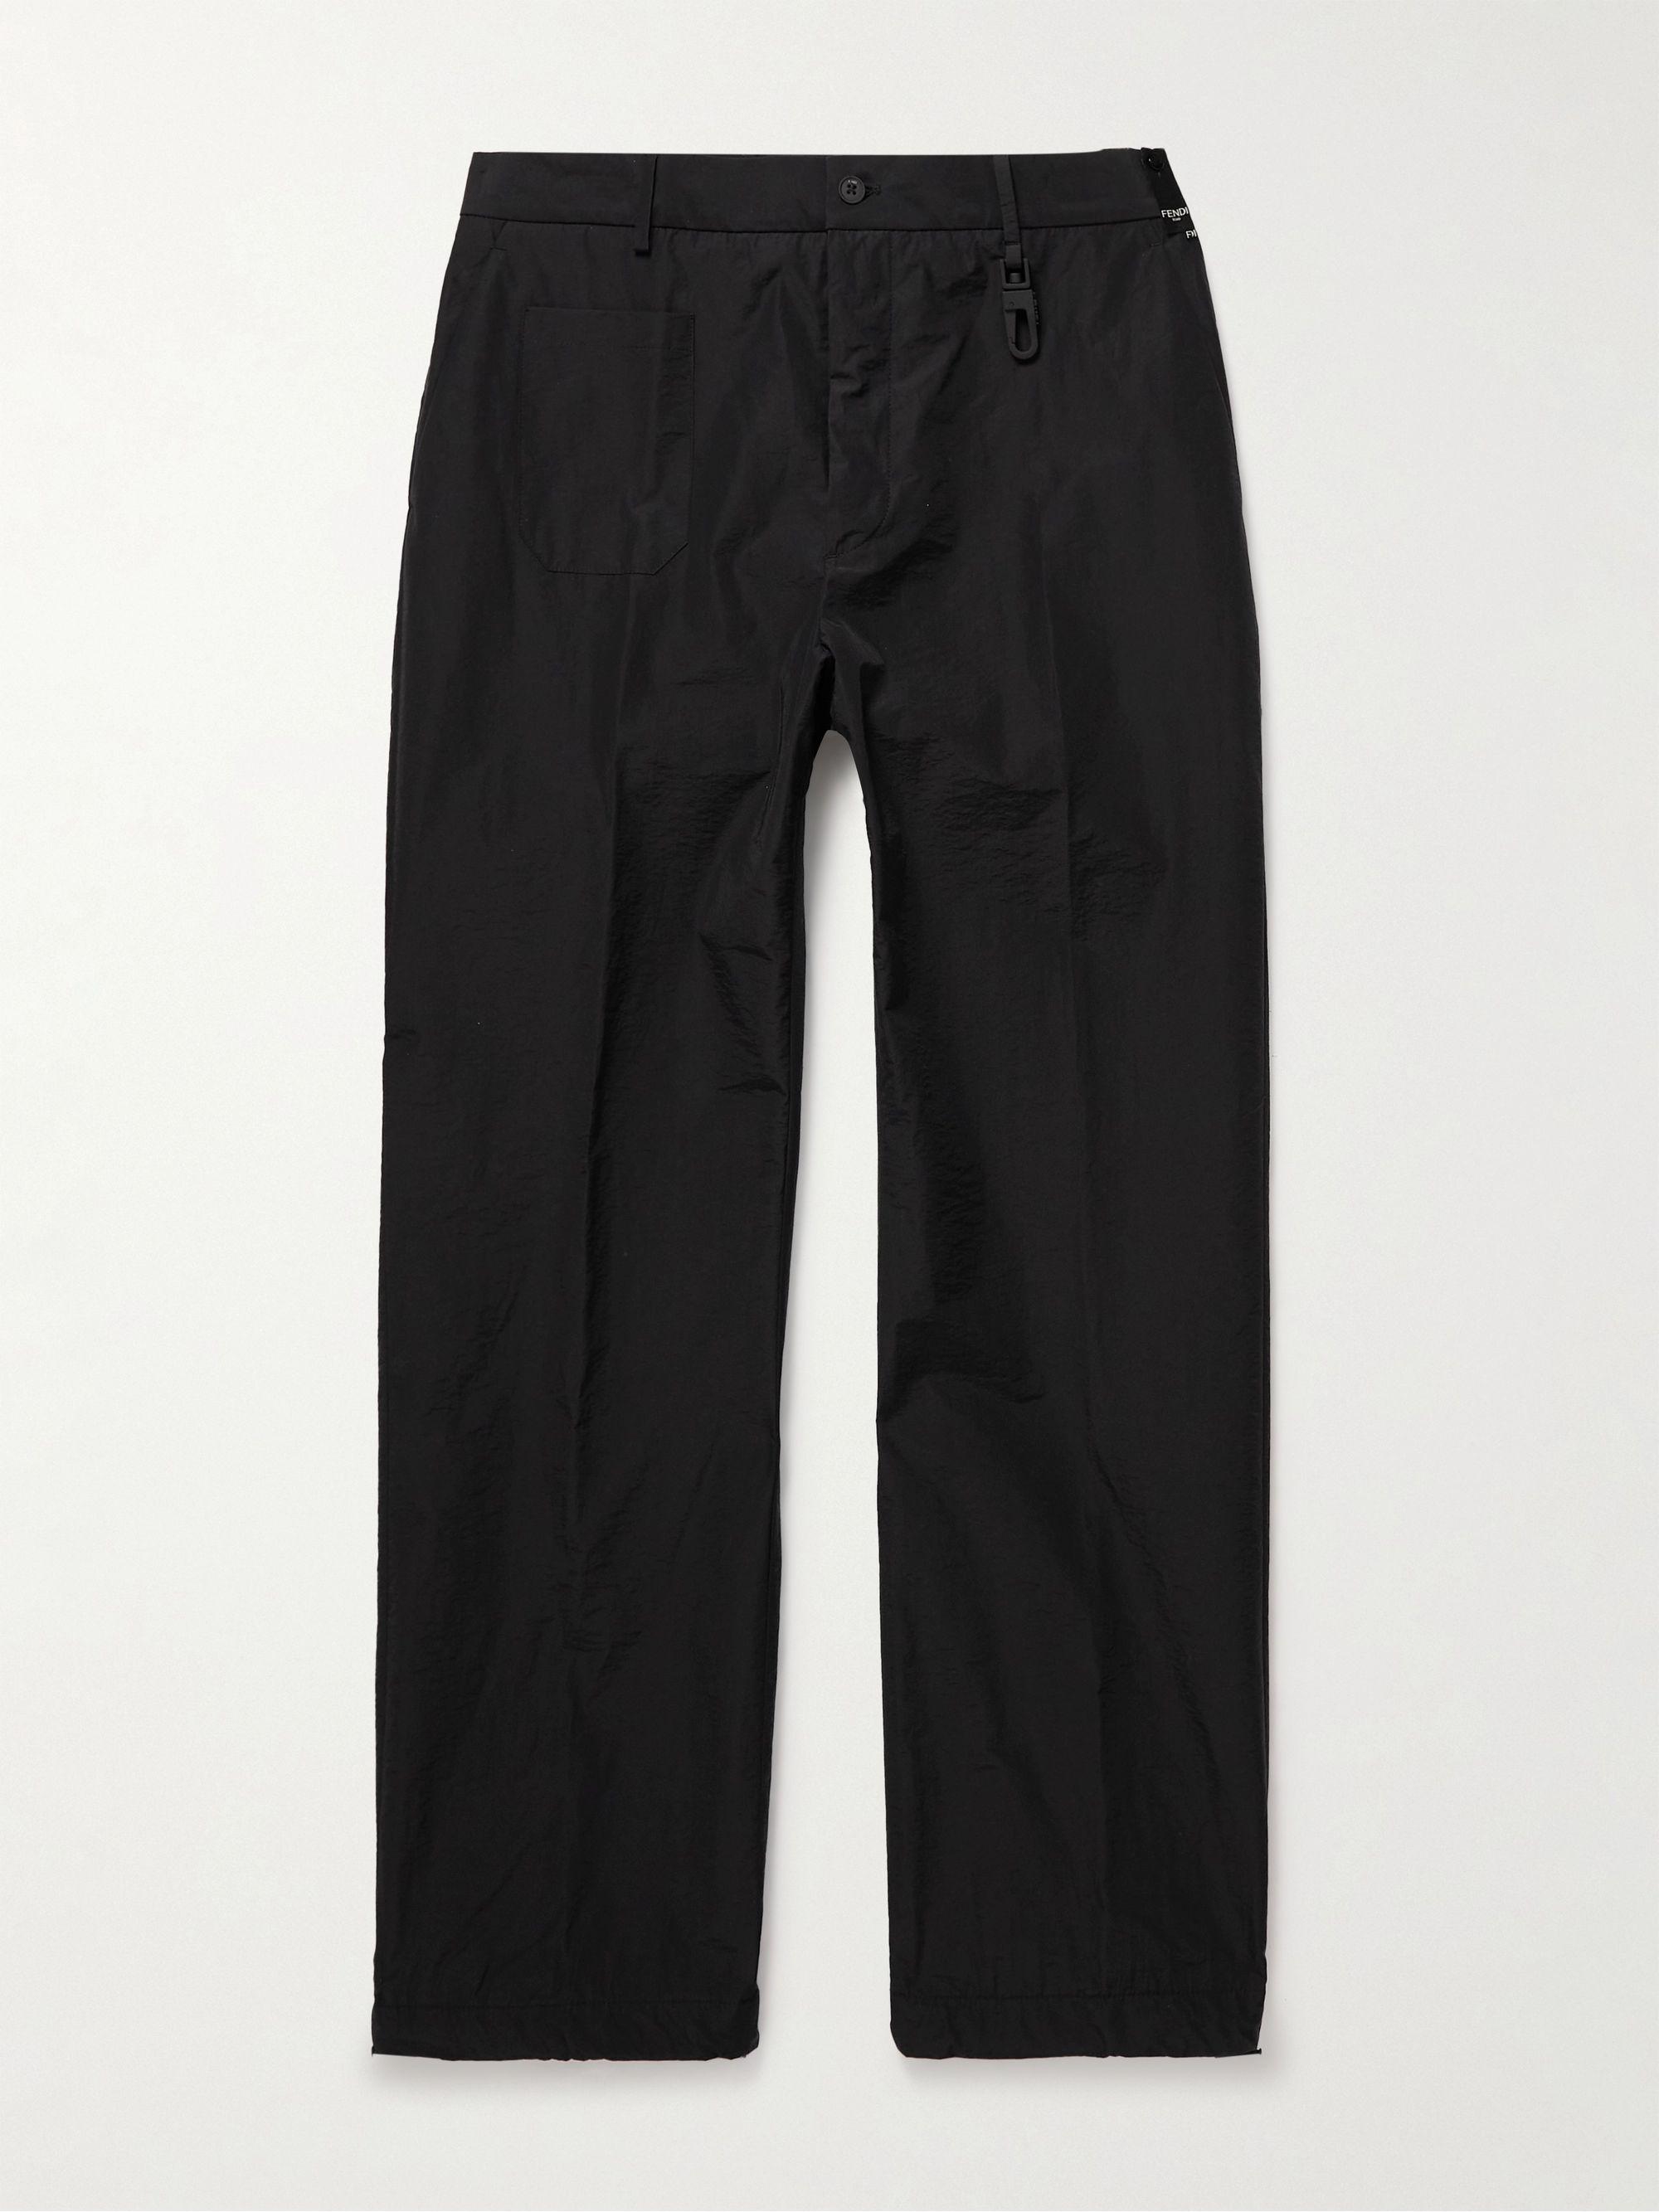 FENDI Cotton-Blend Shell Trousers